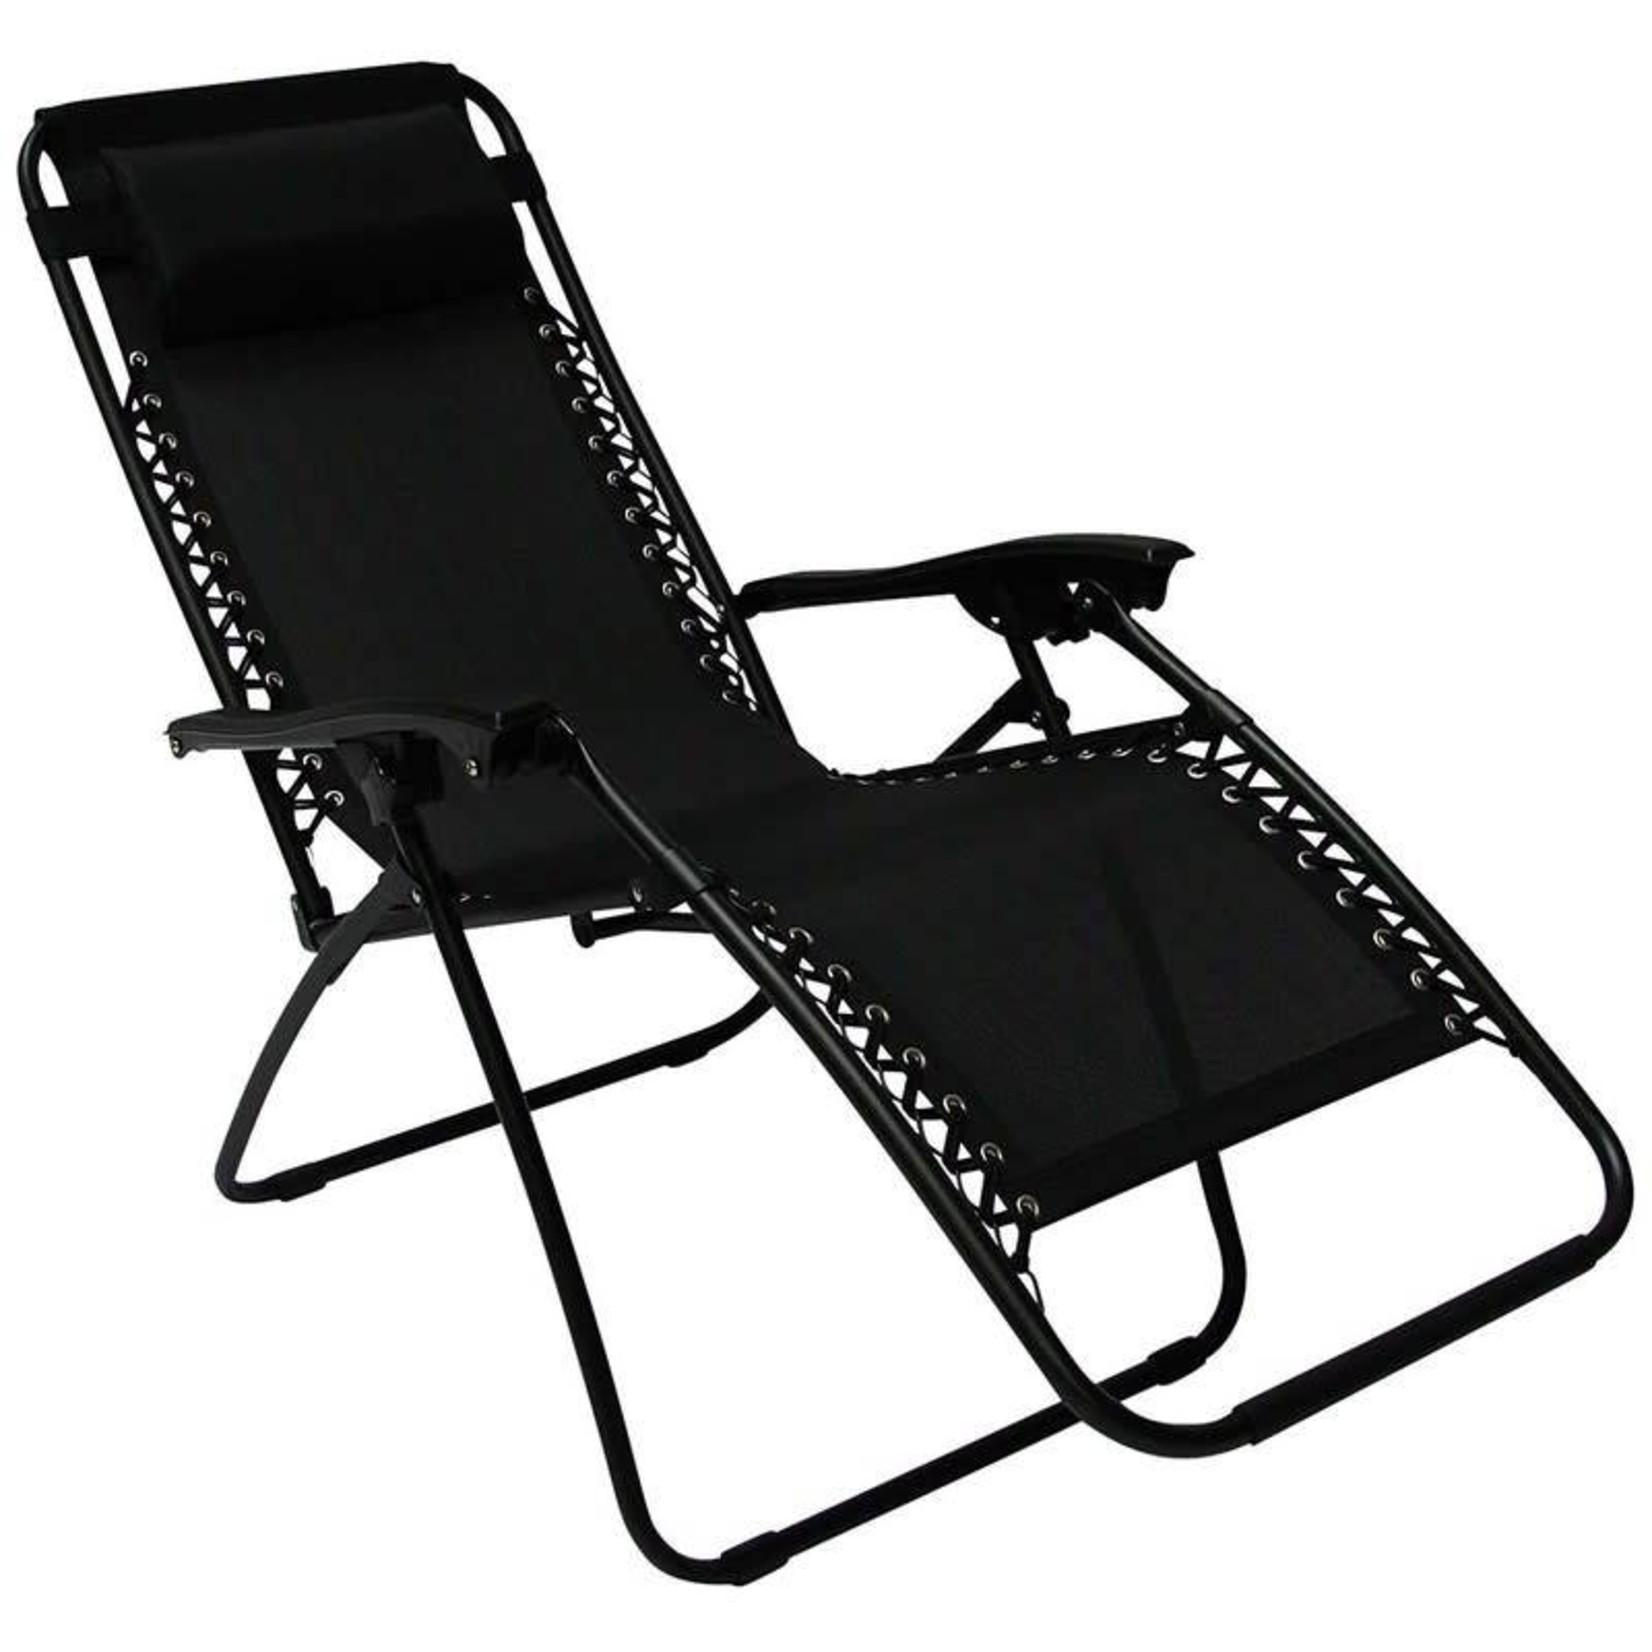 Redwood Heavy Duty Textoline Zero Gravity Reclining Relaxer Garden Sun Lounger Chairs Black